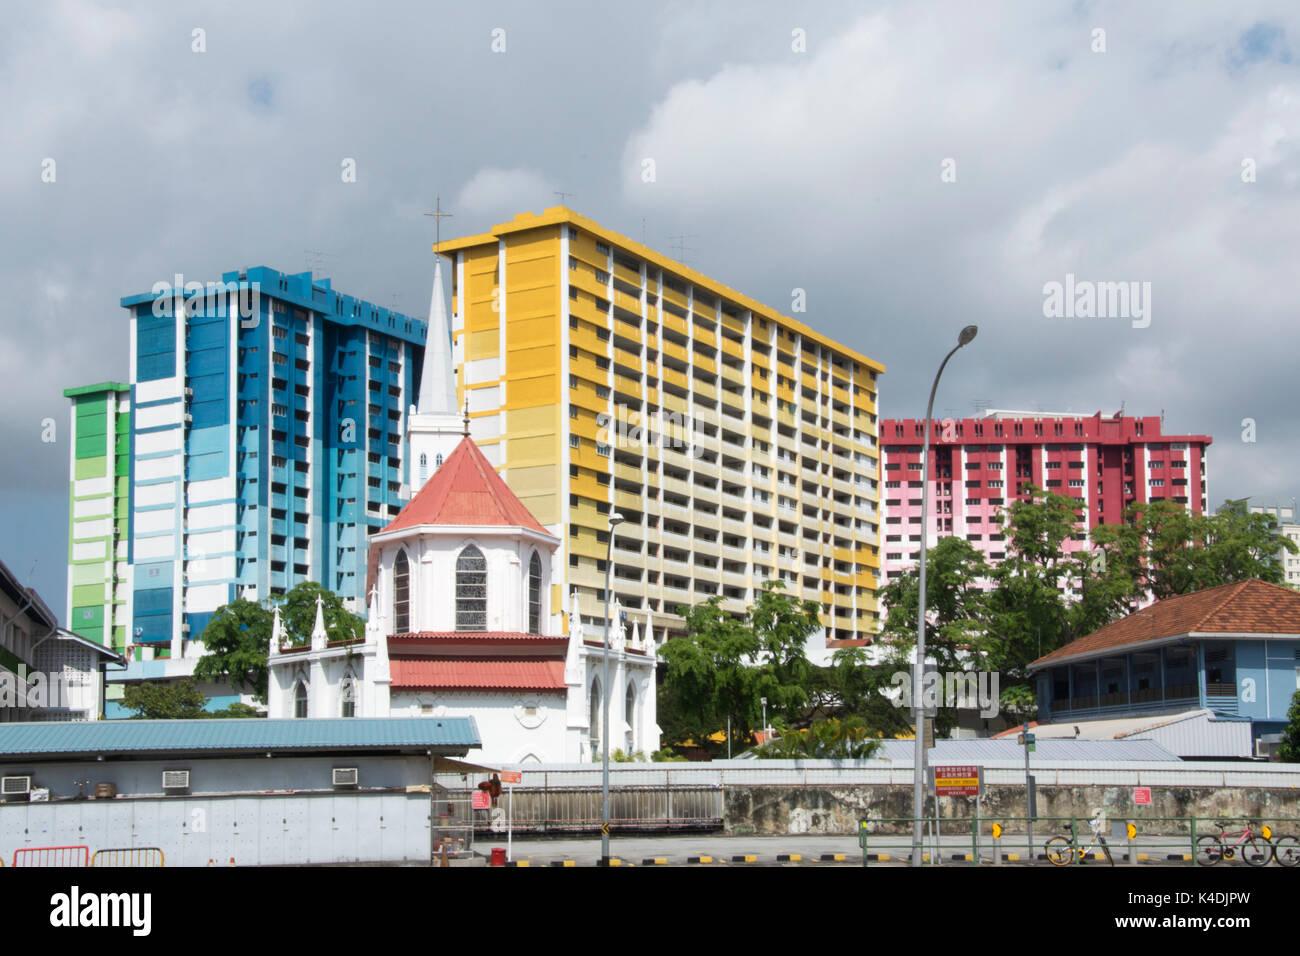 1970s public housing blocks facing demolition ahead of a traffic interchange development, Rochor Road area, Singapore - Stock Image